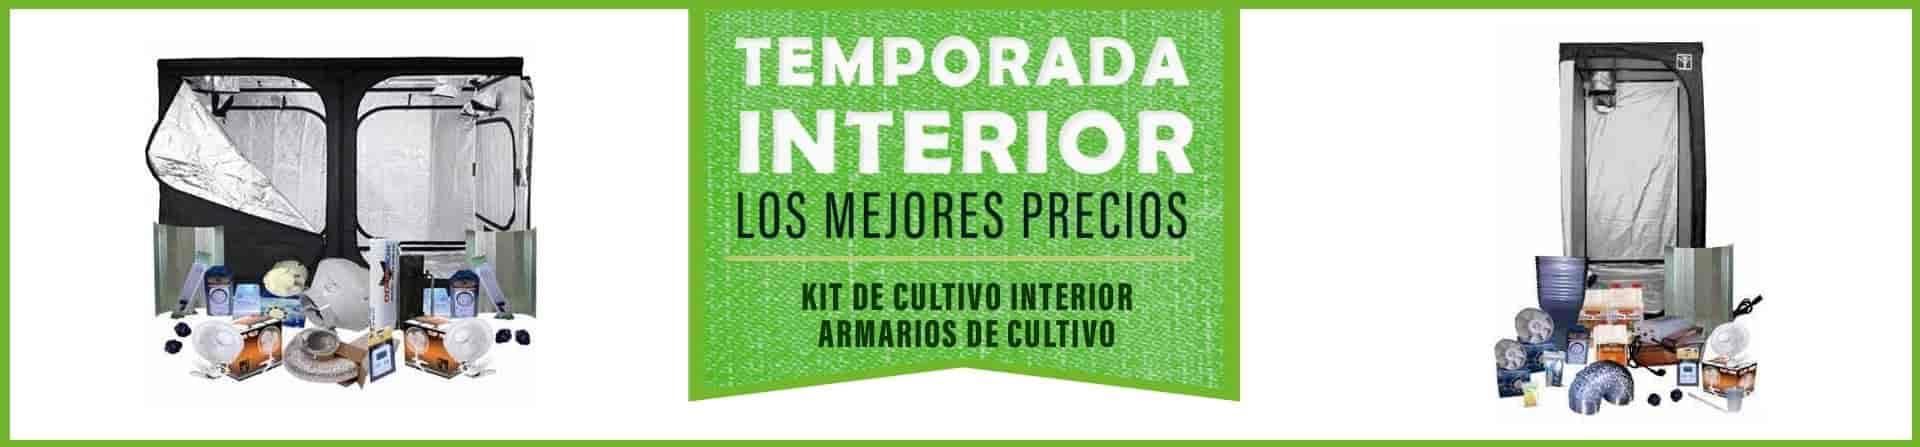 Kit de cultivo interior